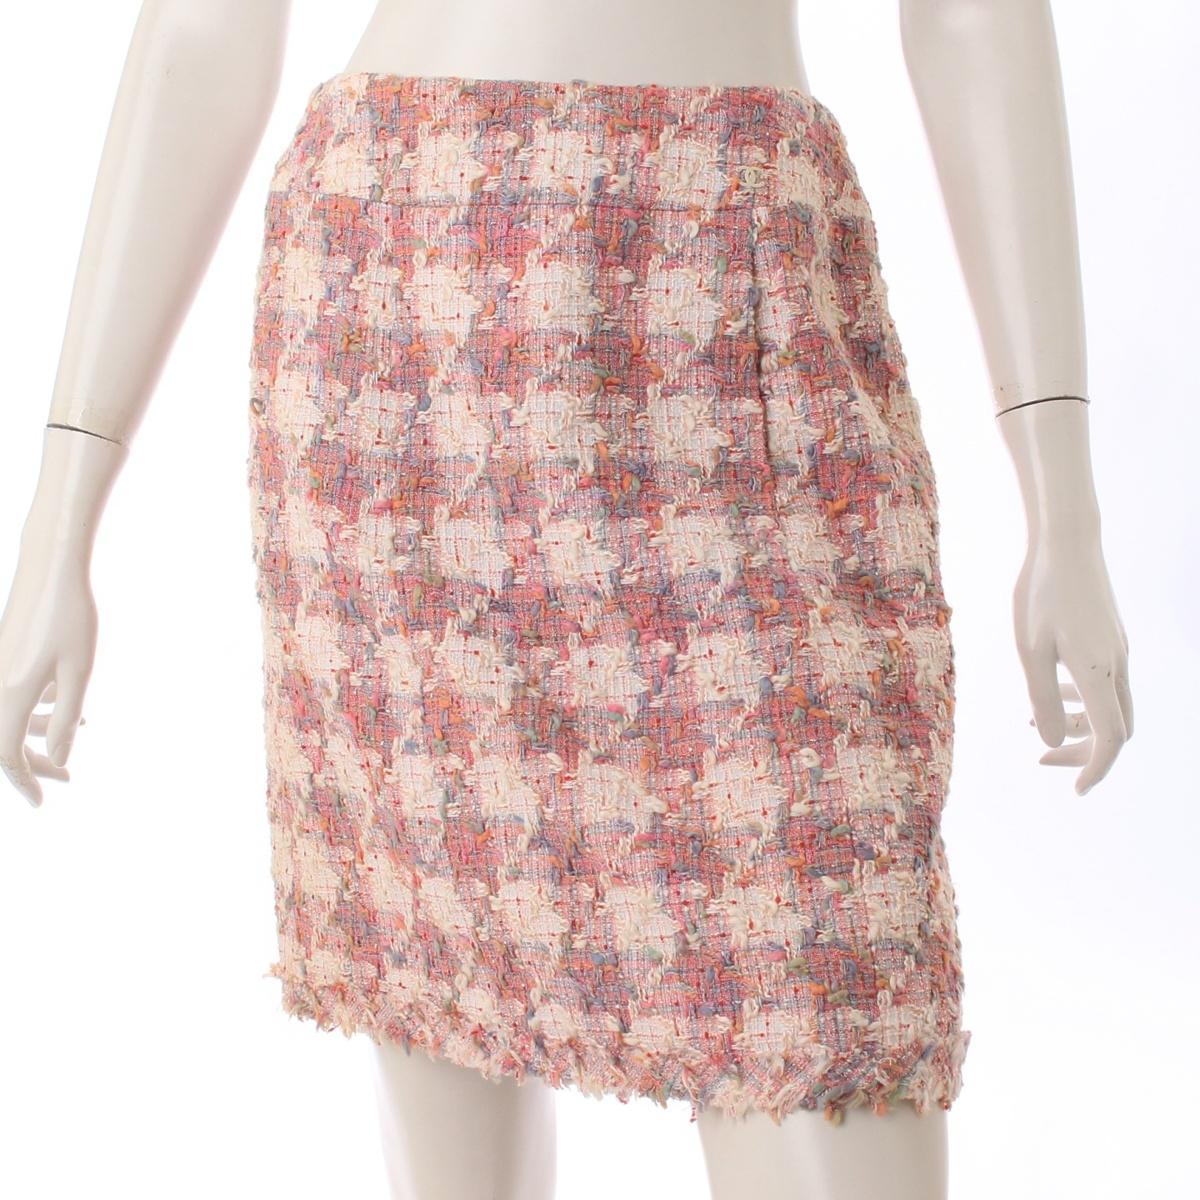 【30%OFFセール】【シャネル】Chanel 04P ツイード スカート P23595 ピンク 38 【中古】【鑑定済・正規品保証】59186